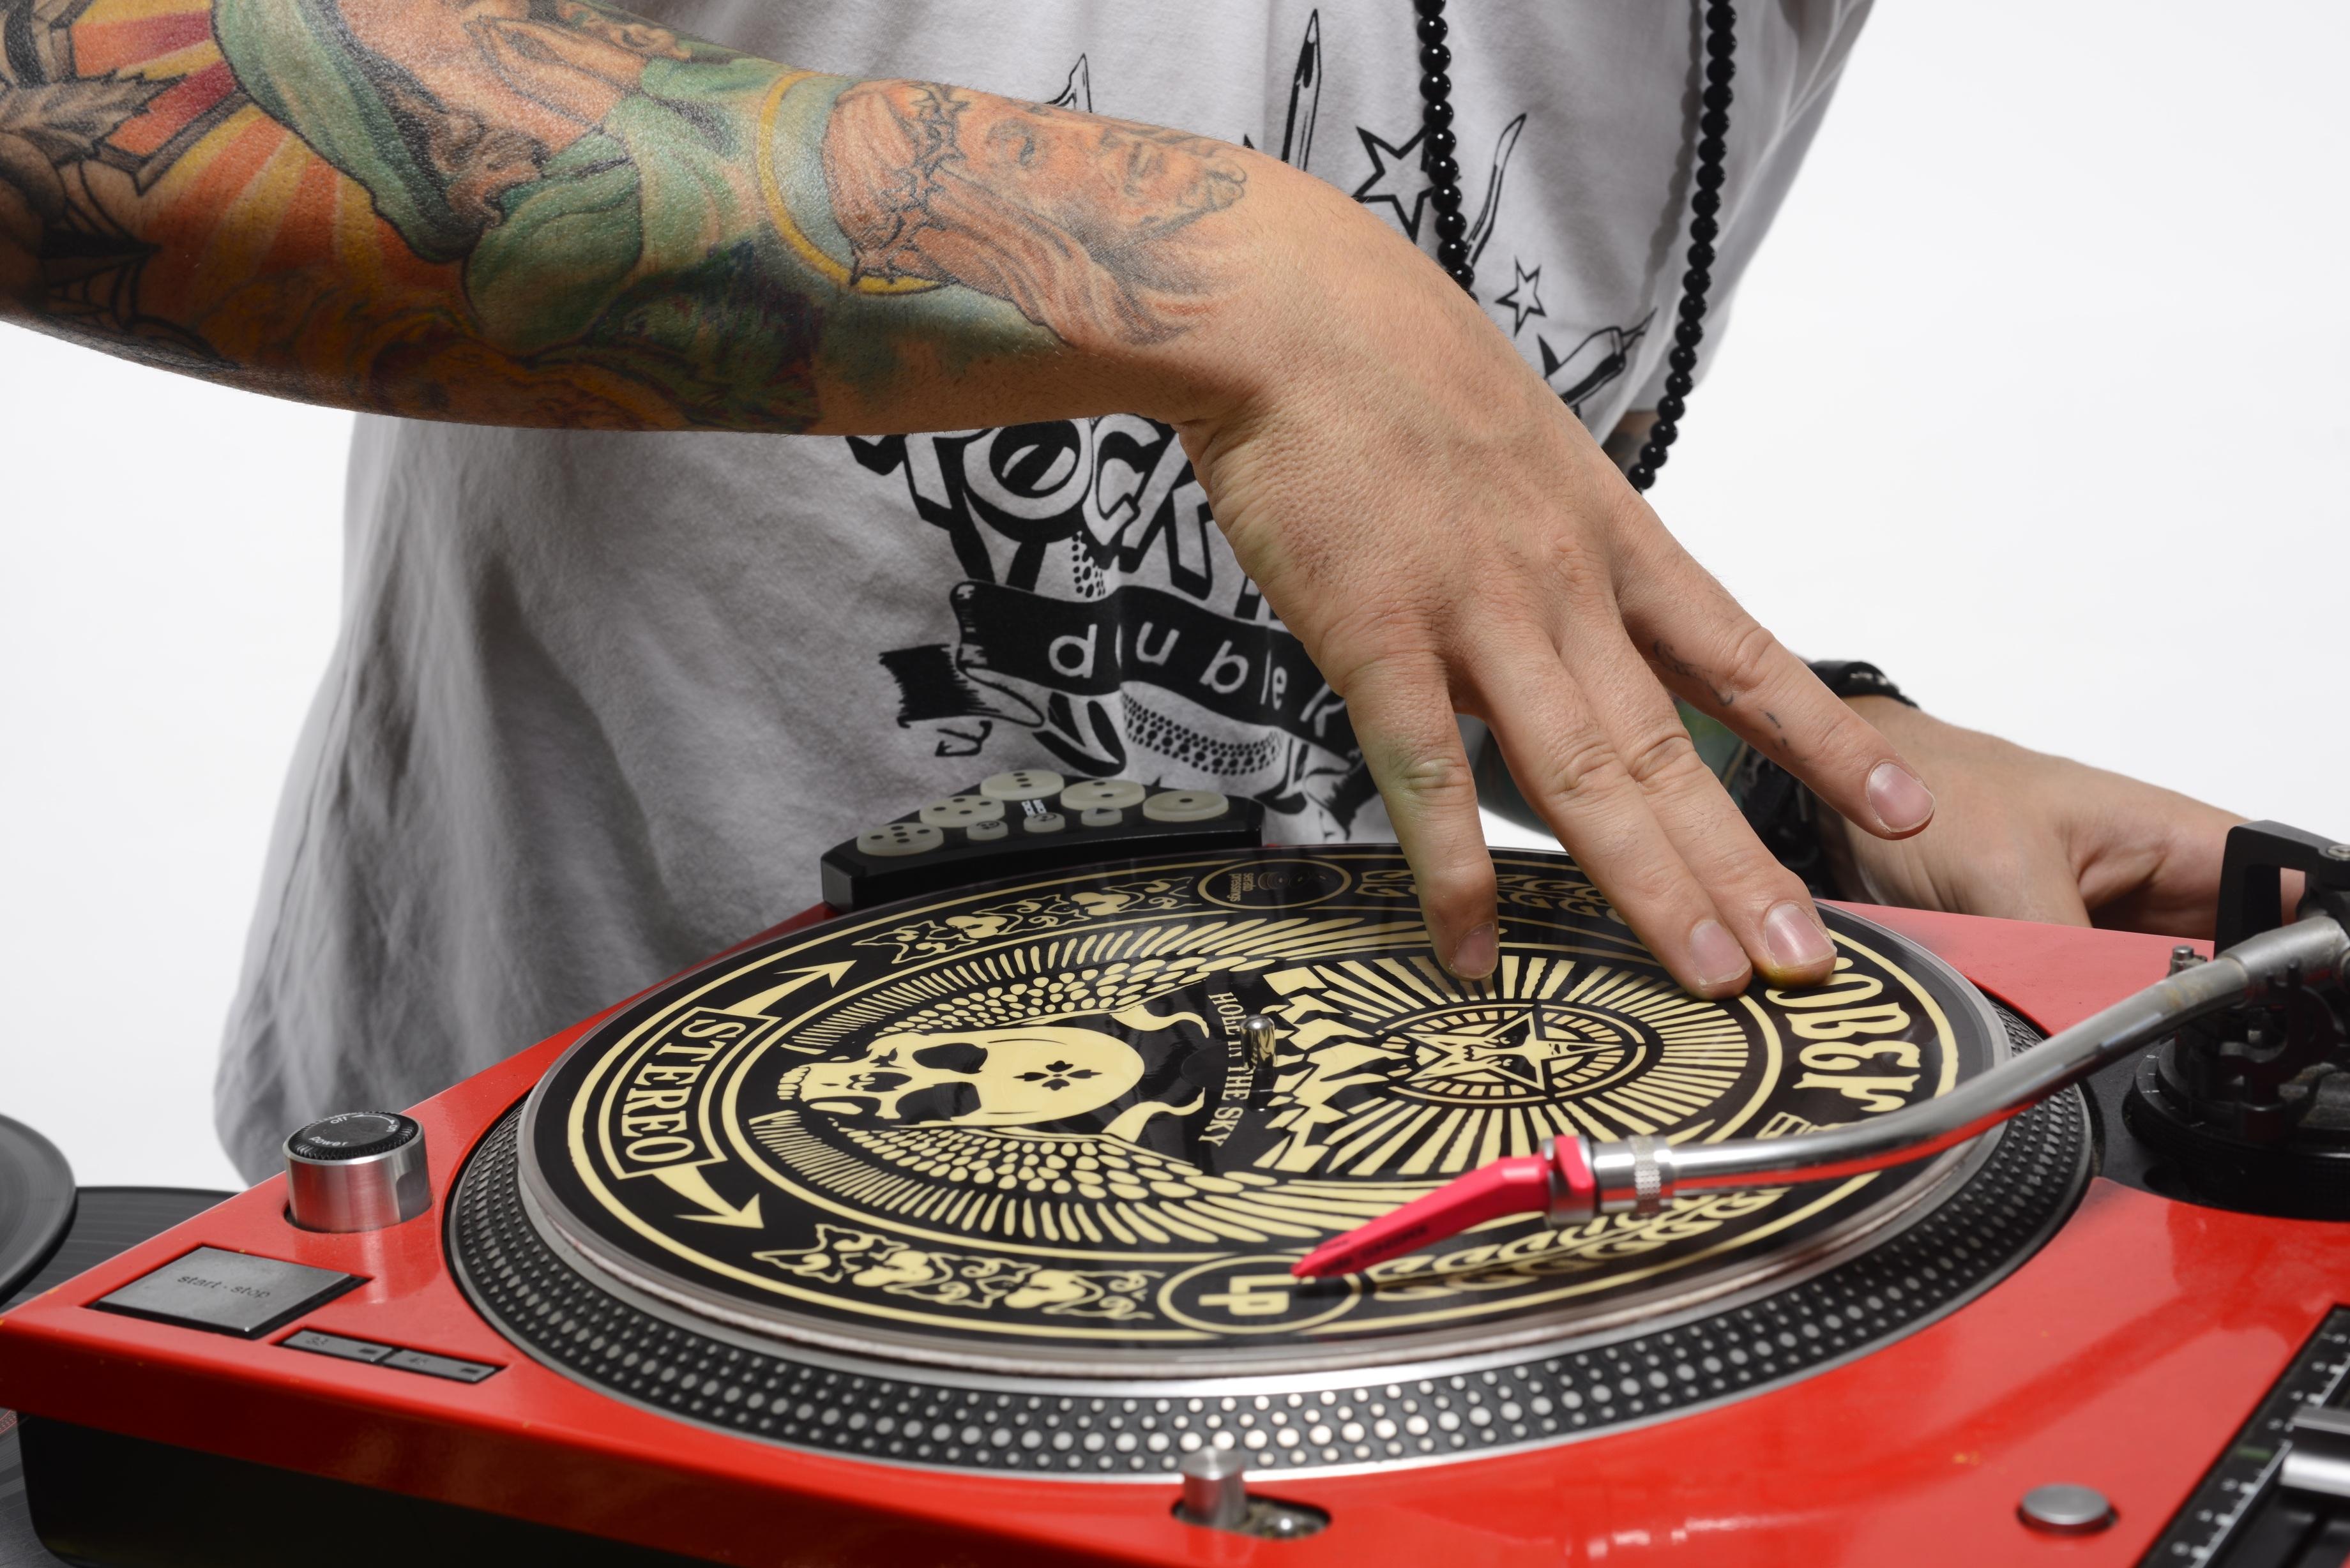 Hand Music Turntable Arm Dj Culture Scratch Tattoos Hip Hop